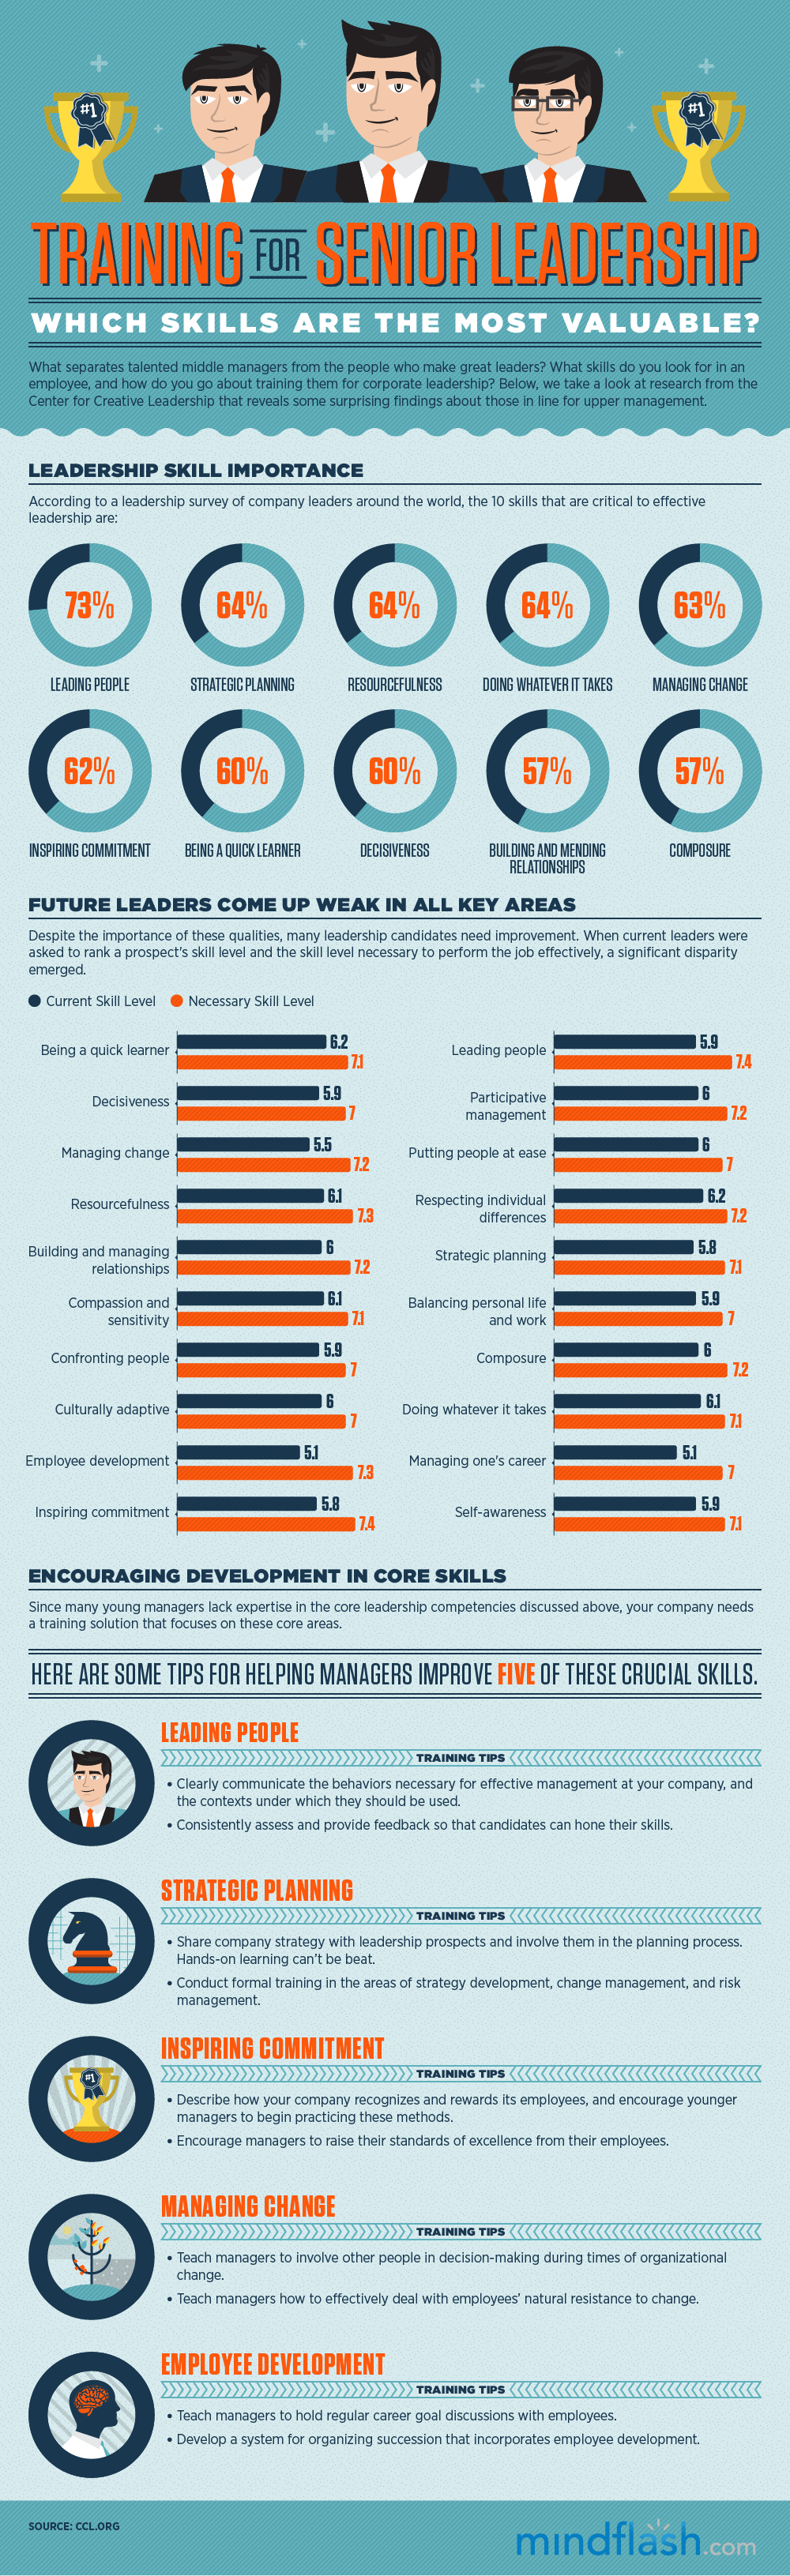 Training-For-Senior-Leadership-infographic.png